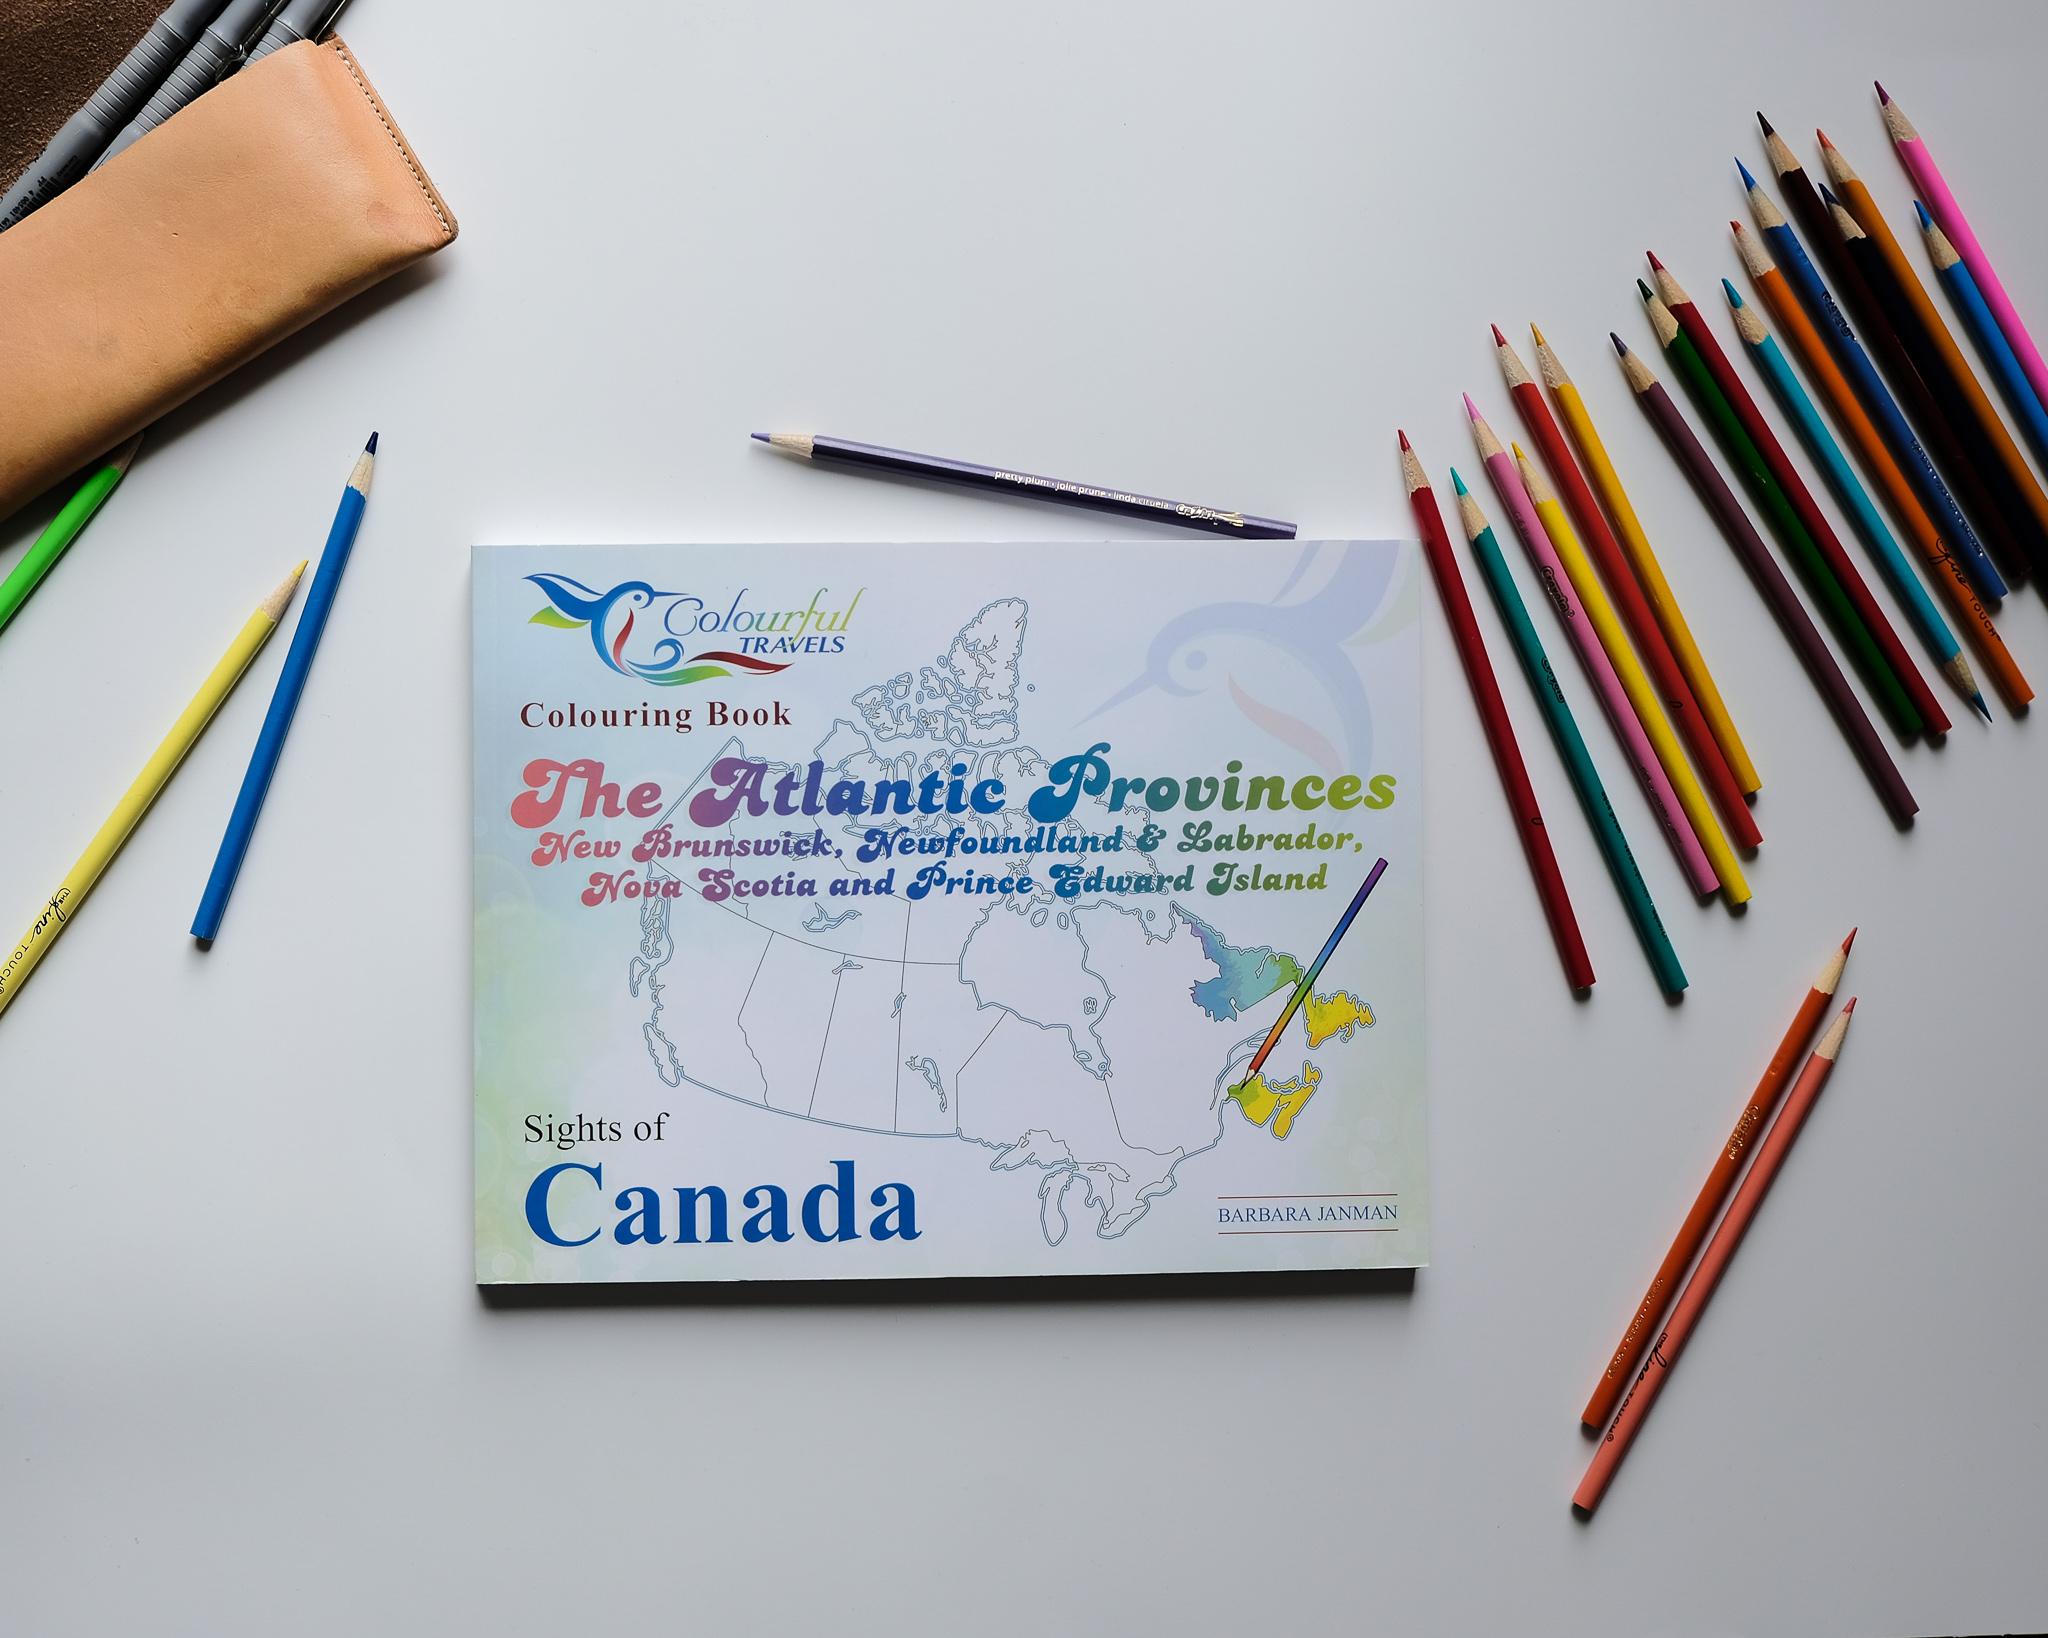 The Atlantic Provinces - Sights of Canada